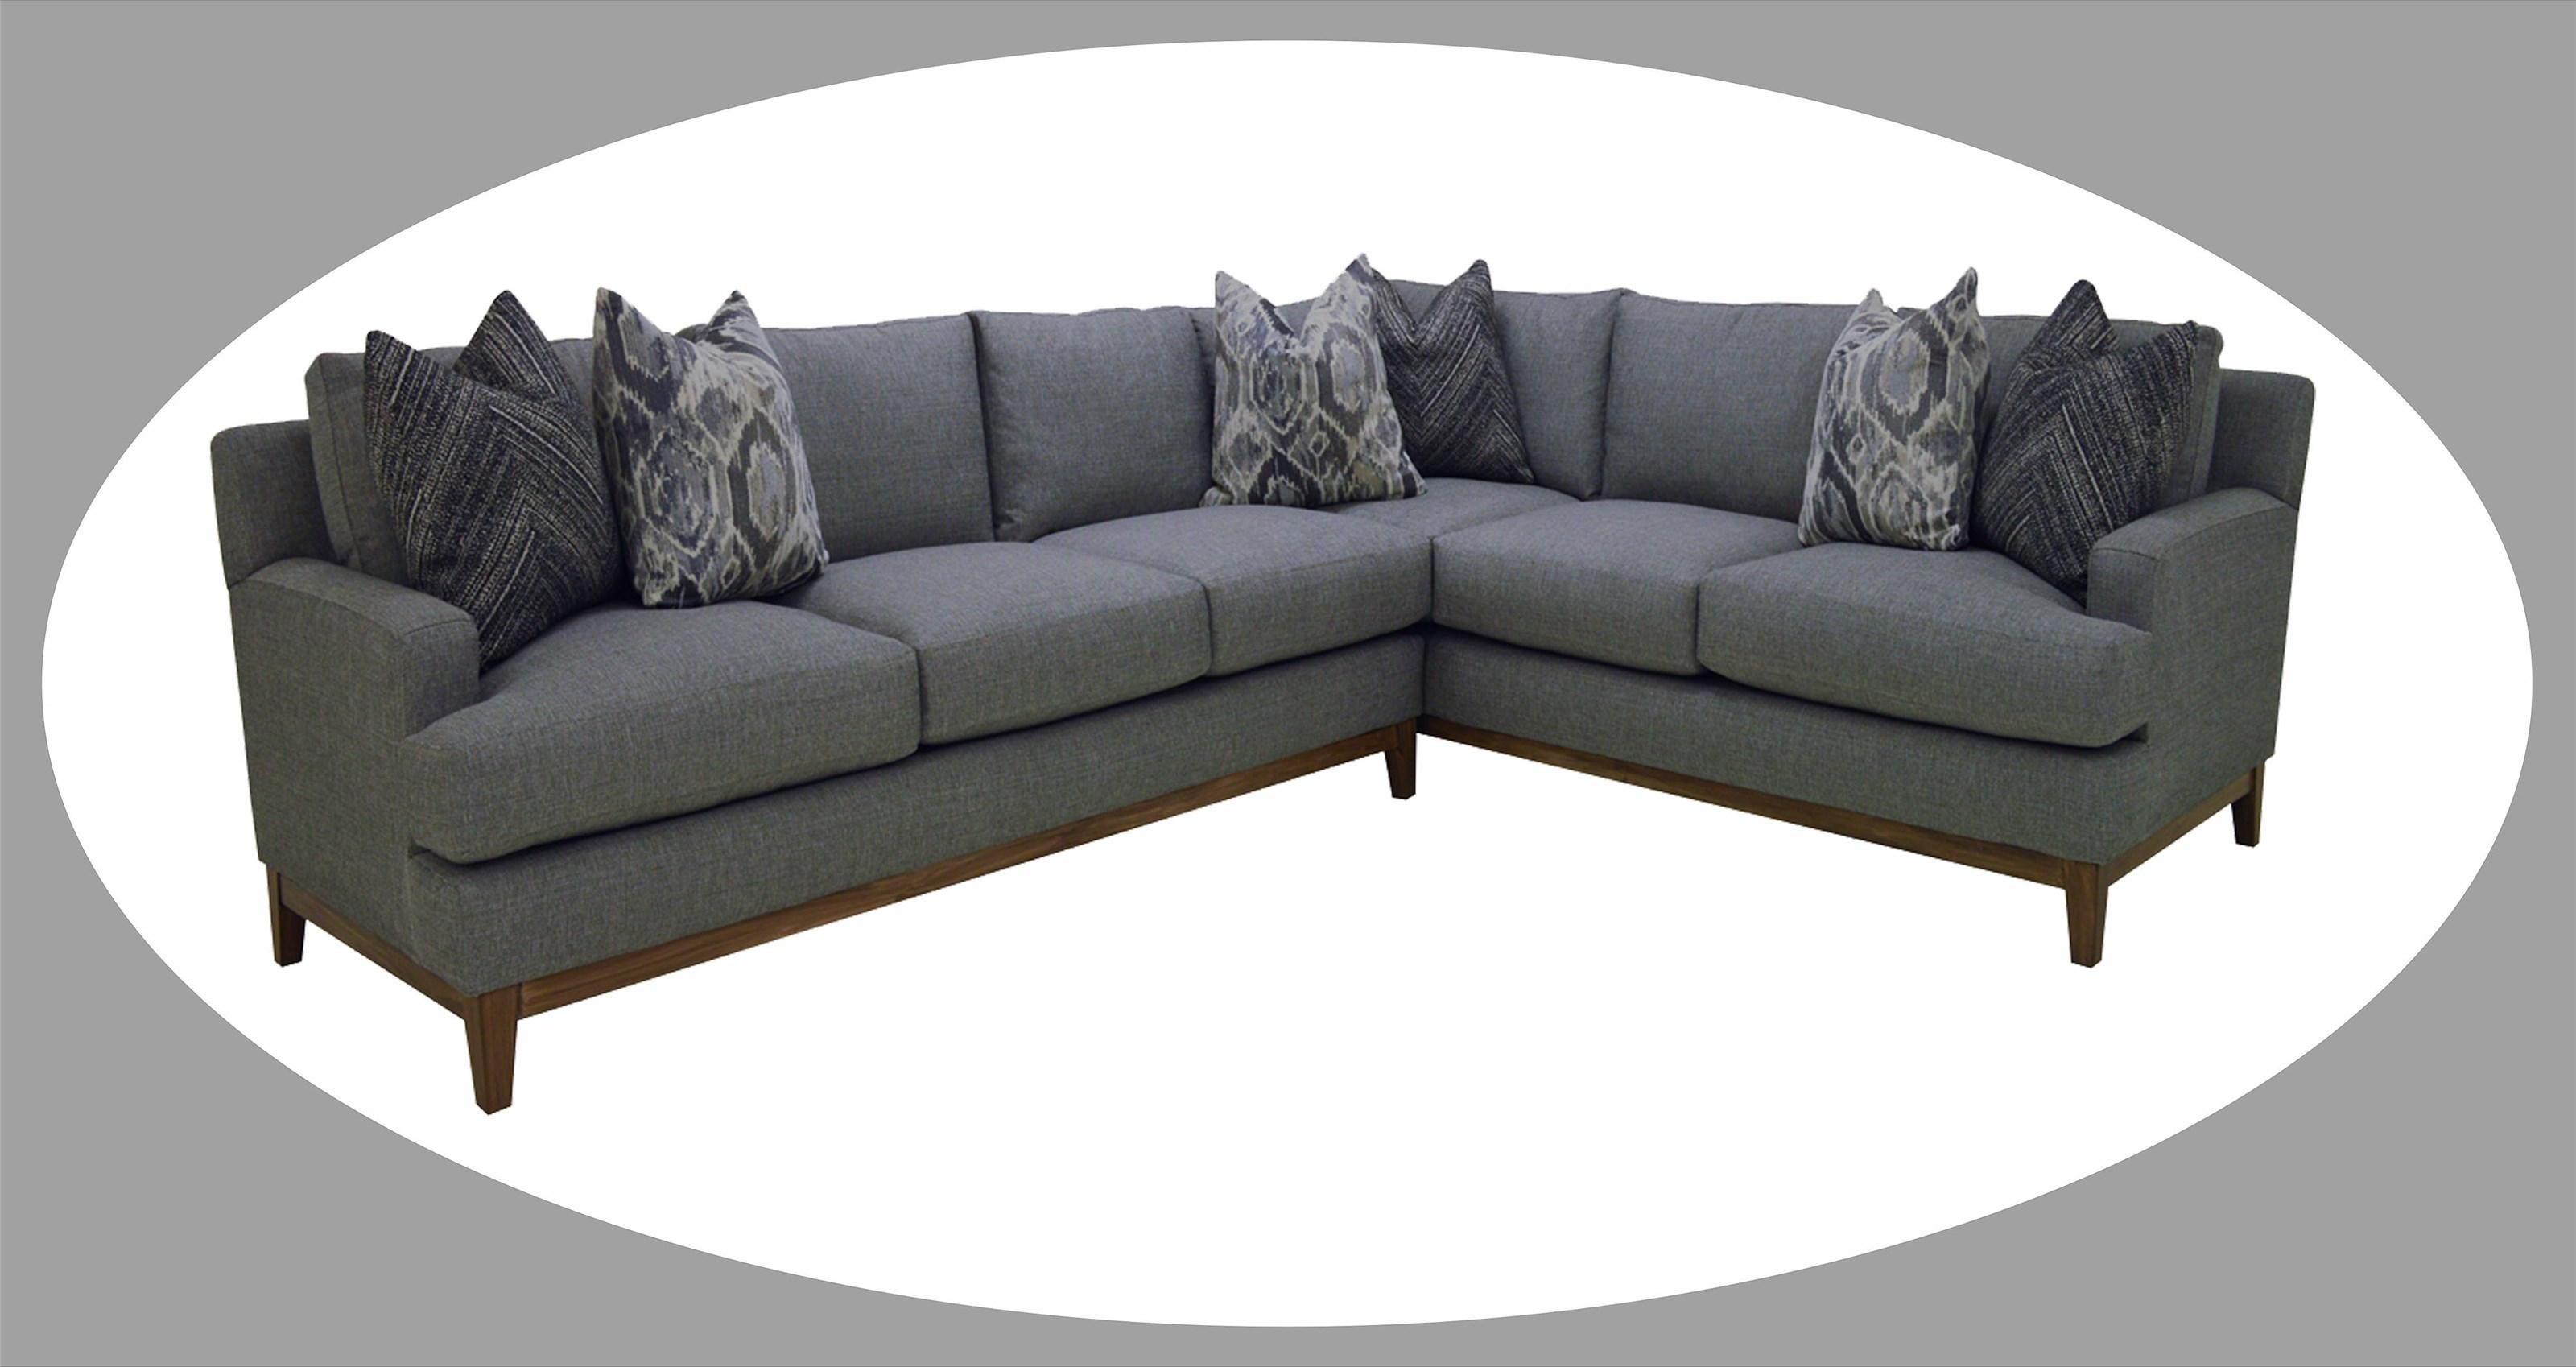 Reeds Trading Company Boston Sectional Sofa Item Number 6071da 05 06